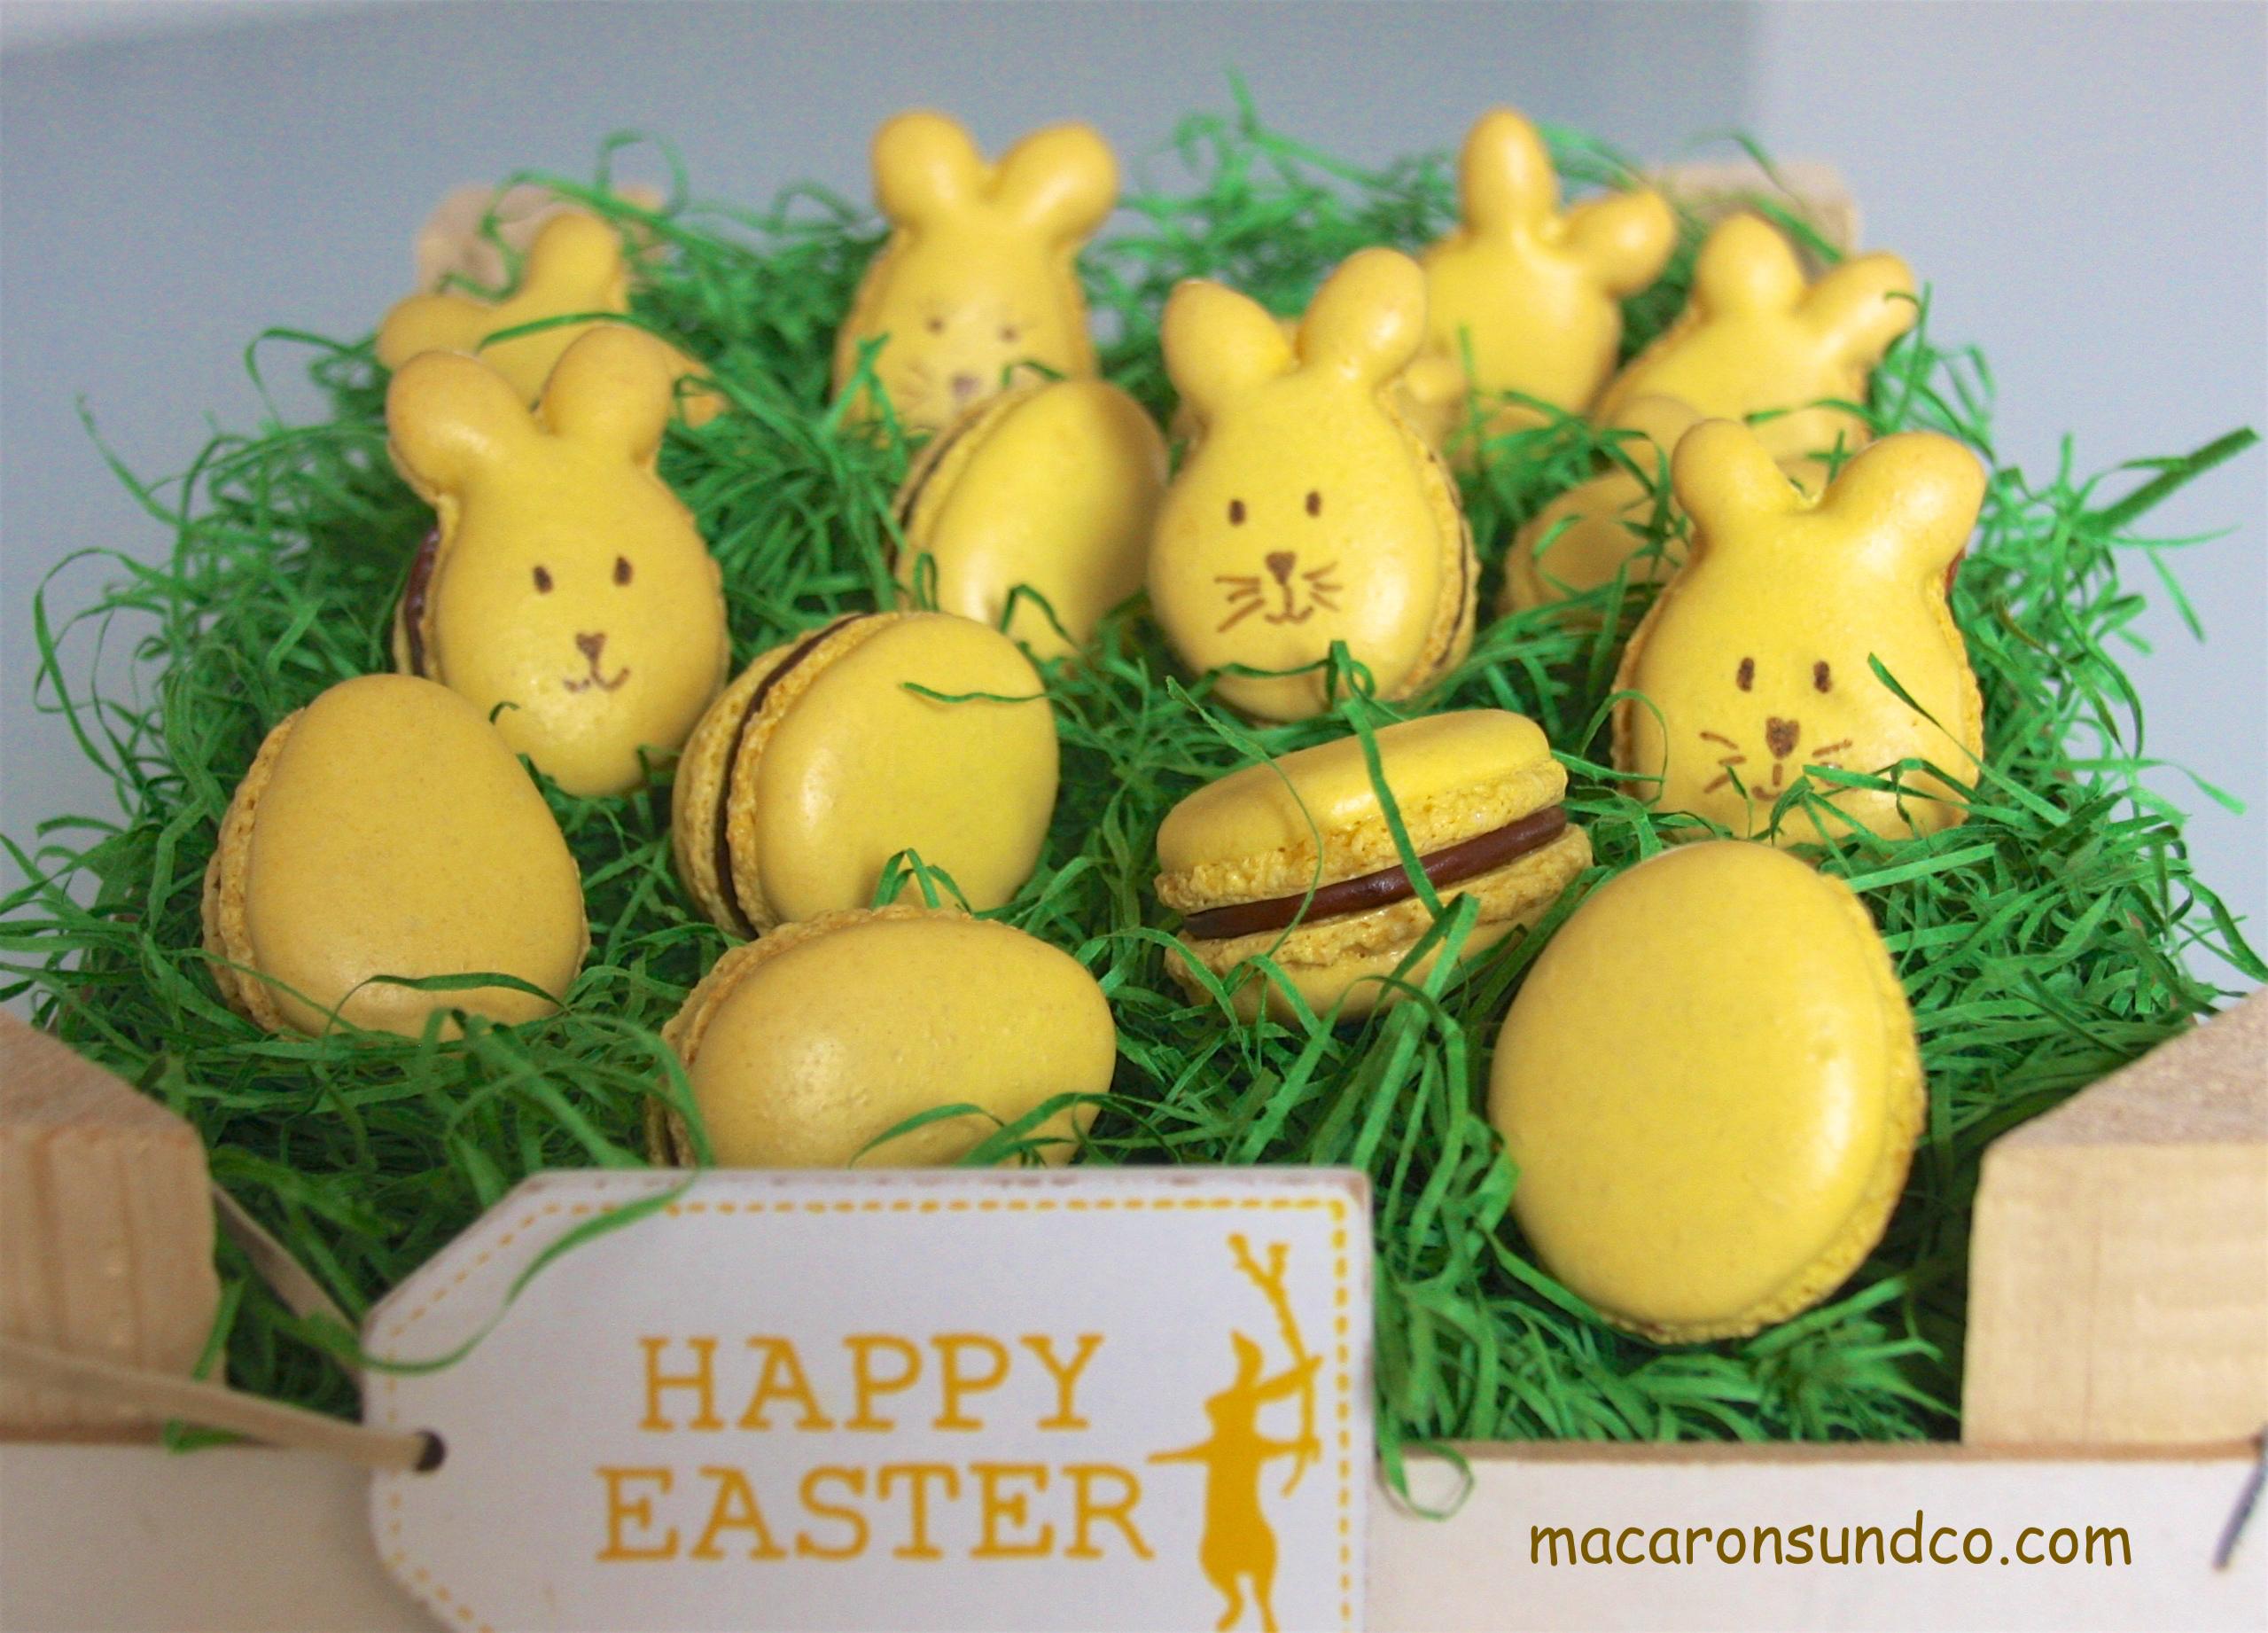 Frohe Ostern 🐣 Joyeuses Pâques 🐣